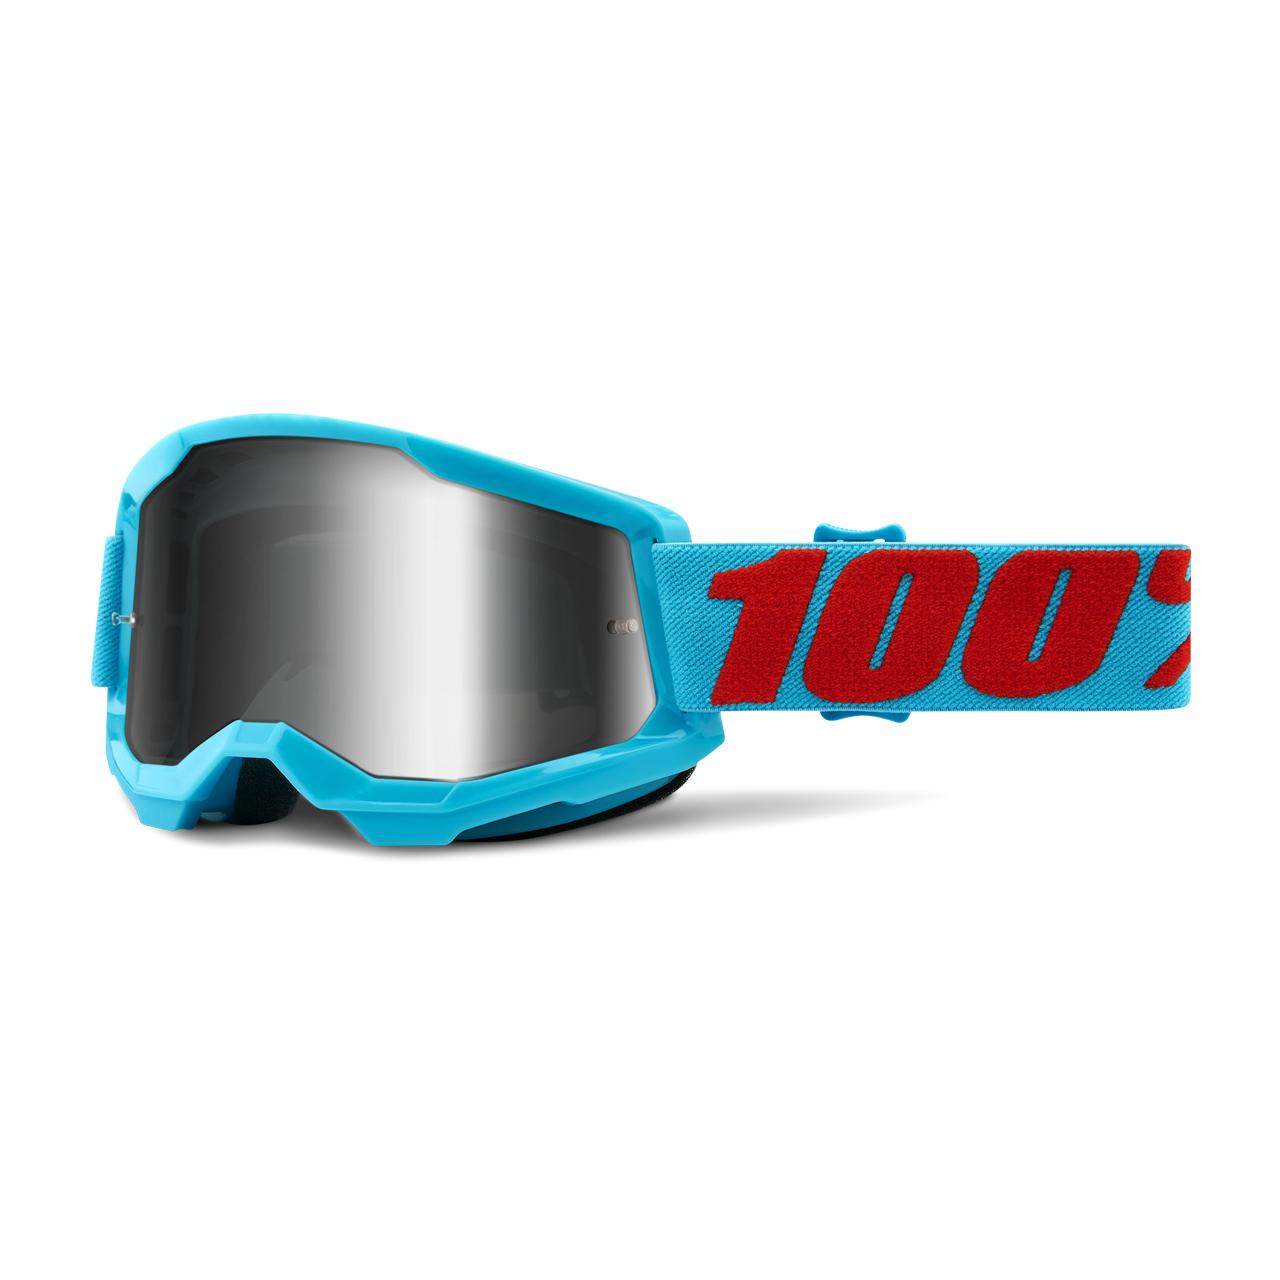 100% Masque Cross 100% Strata 2 Summit Bleu-Rouge